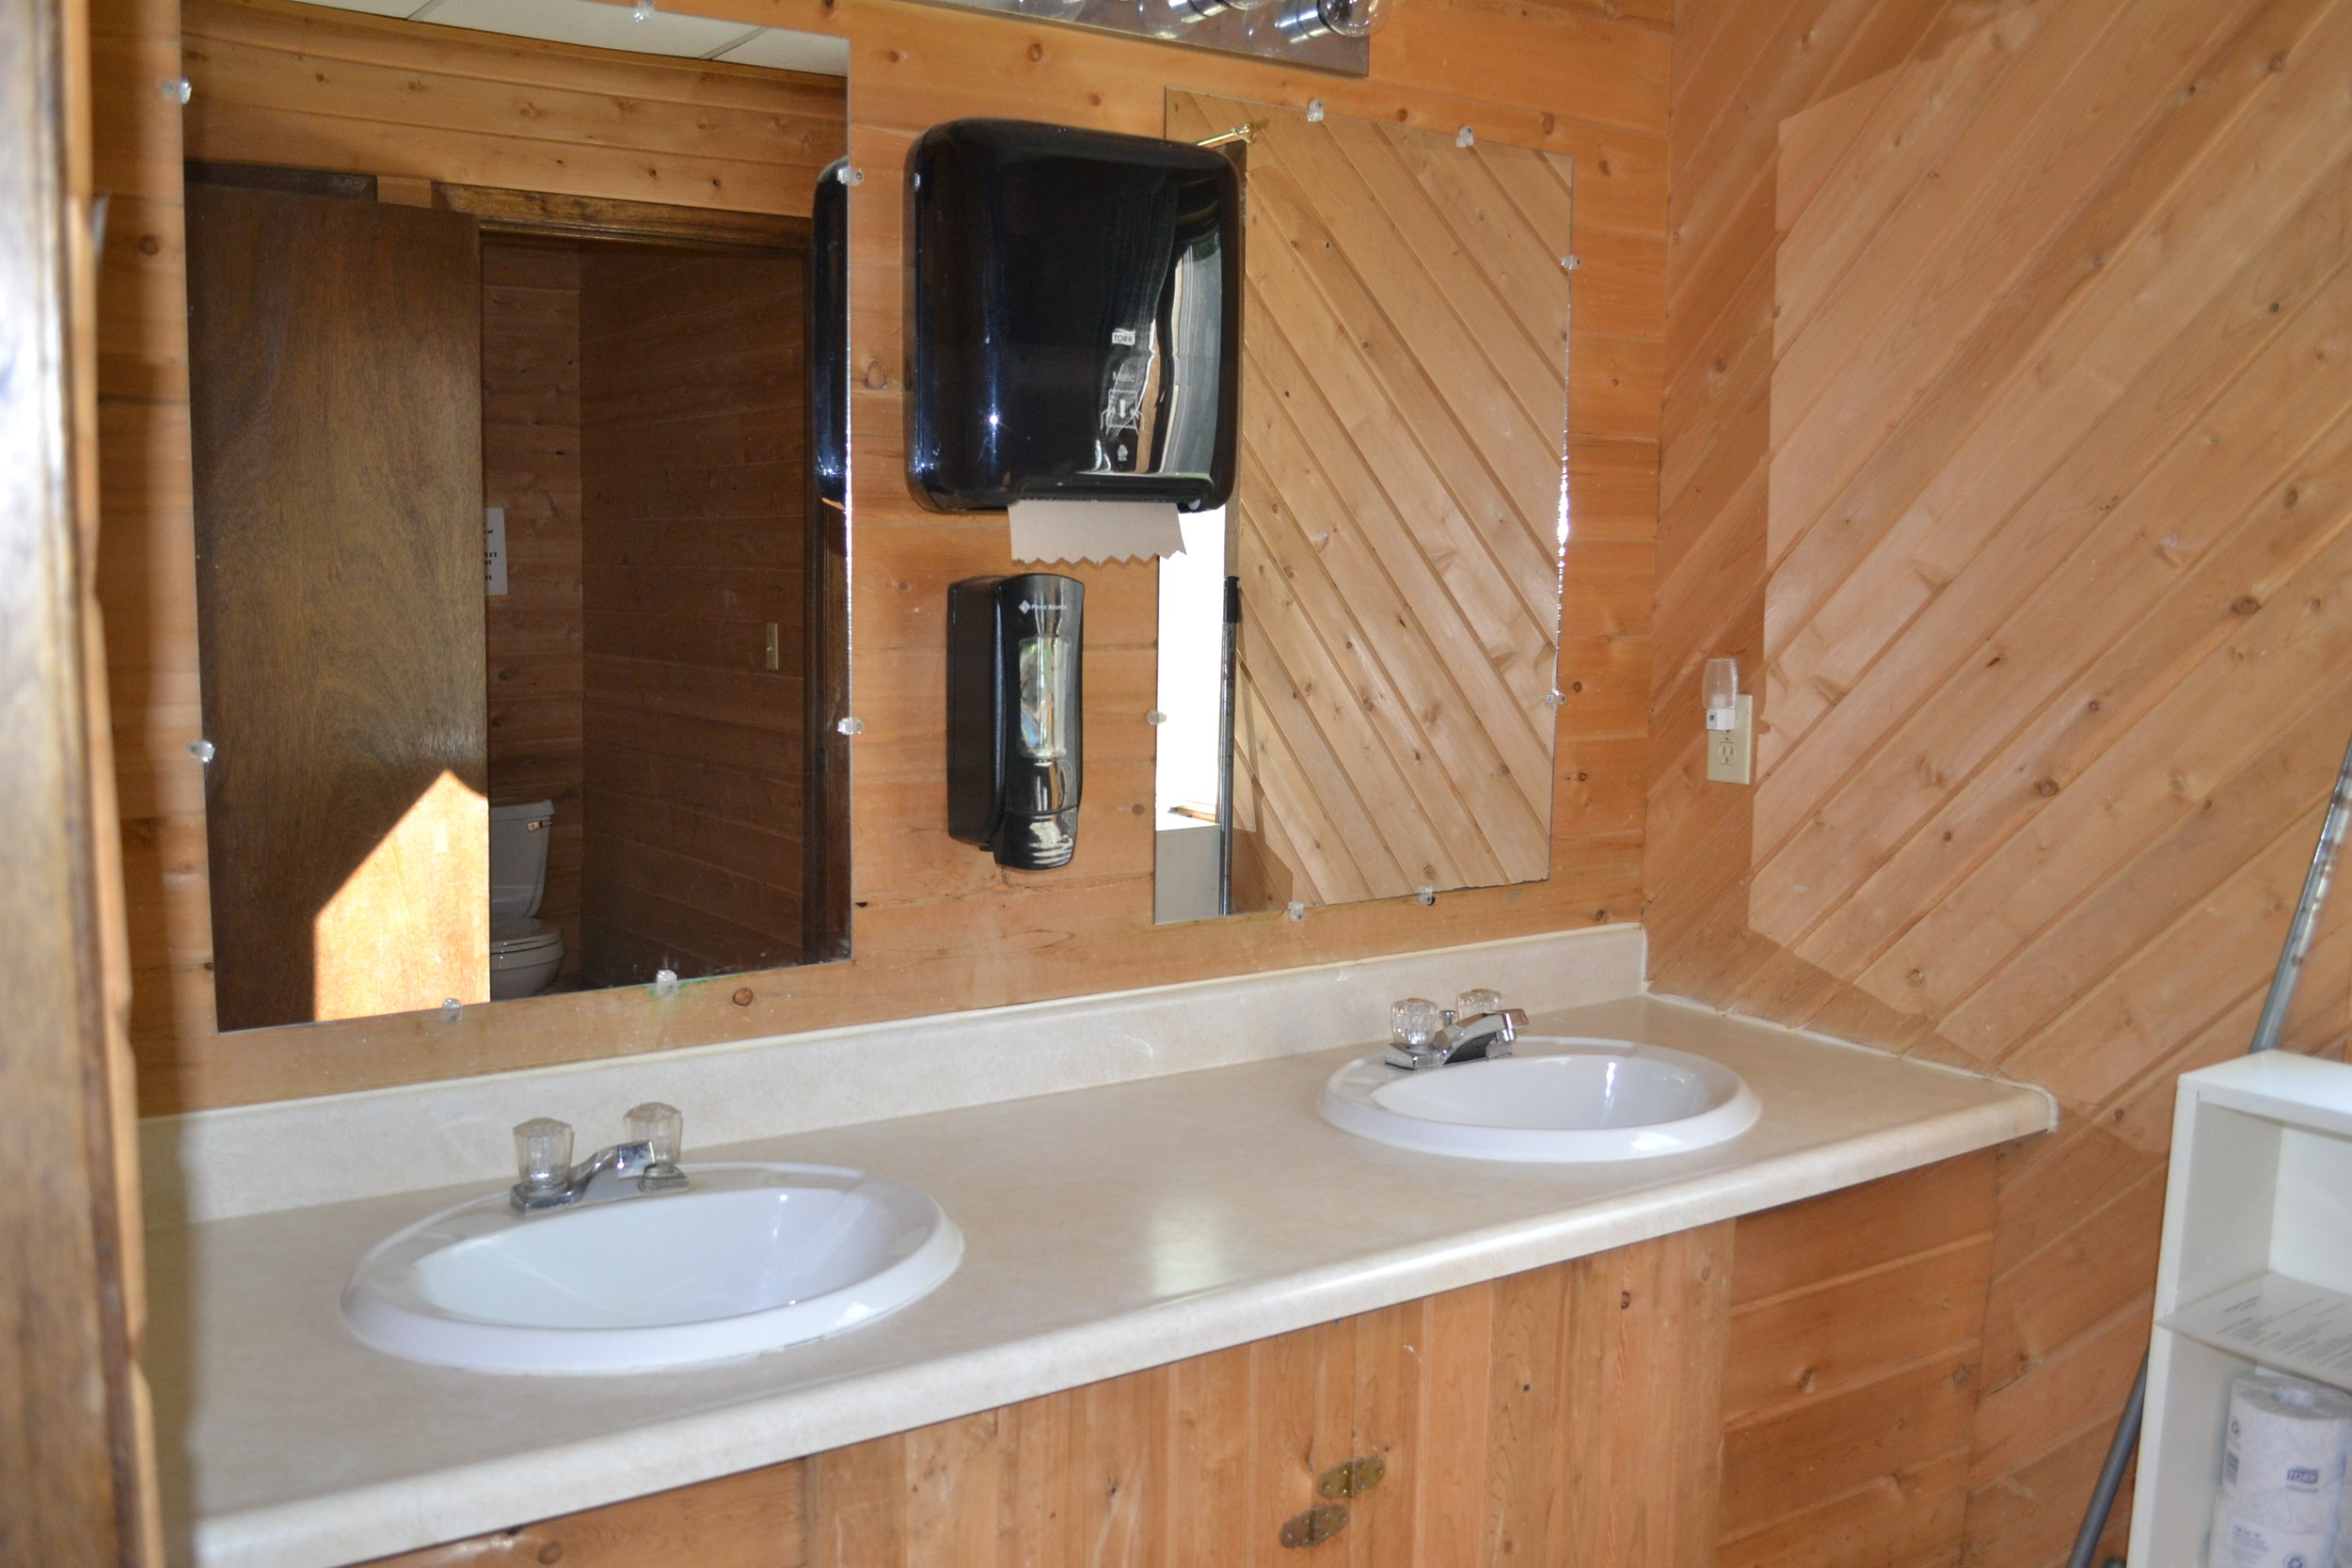 each dorm room has its own bathroom